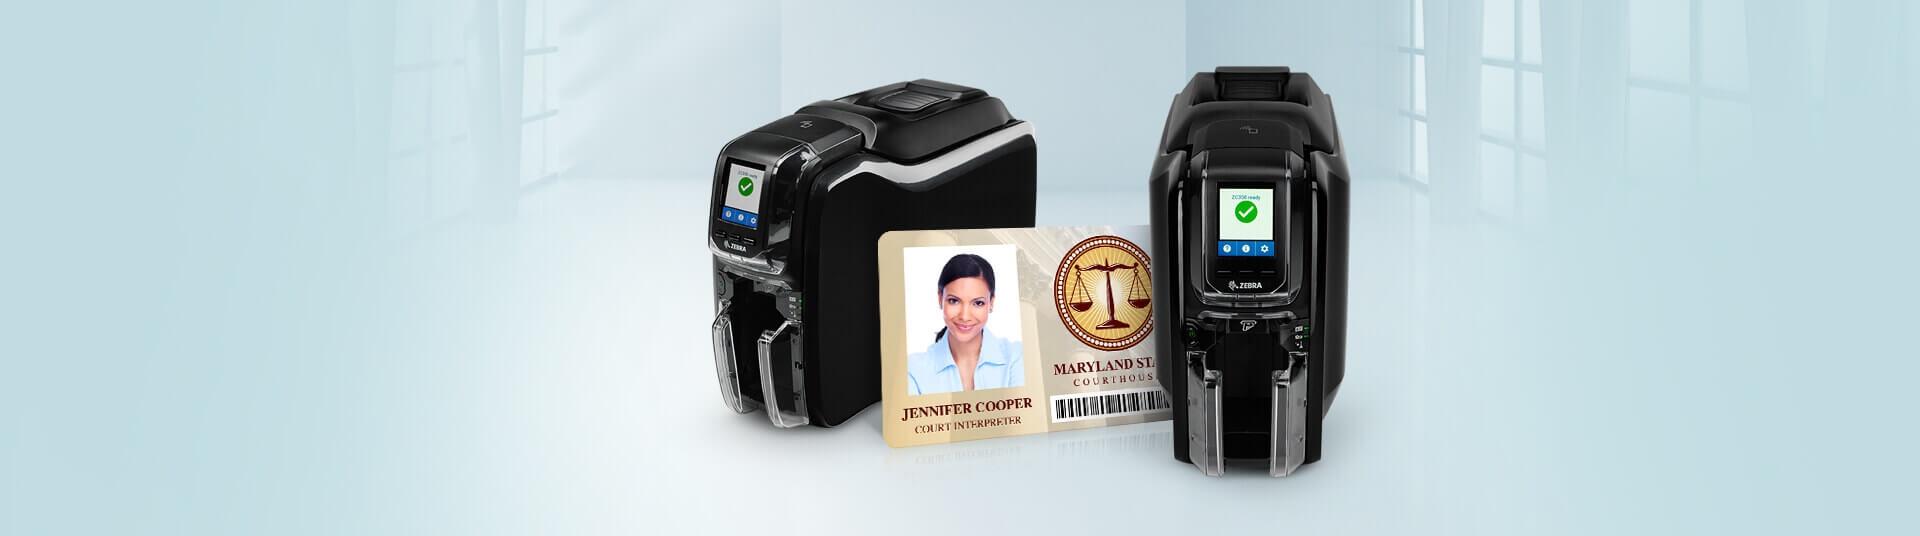 Zebra ZC350 ID Card Printers